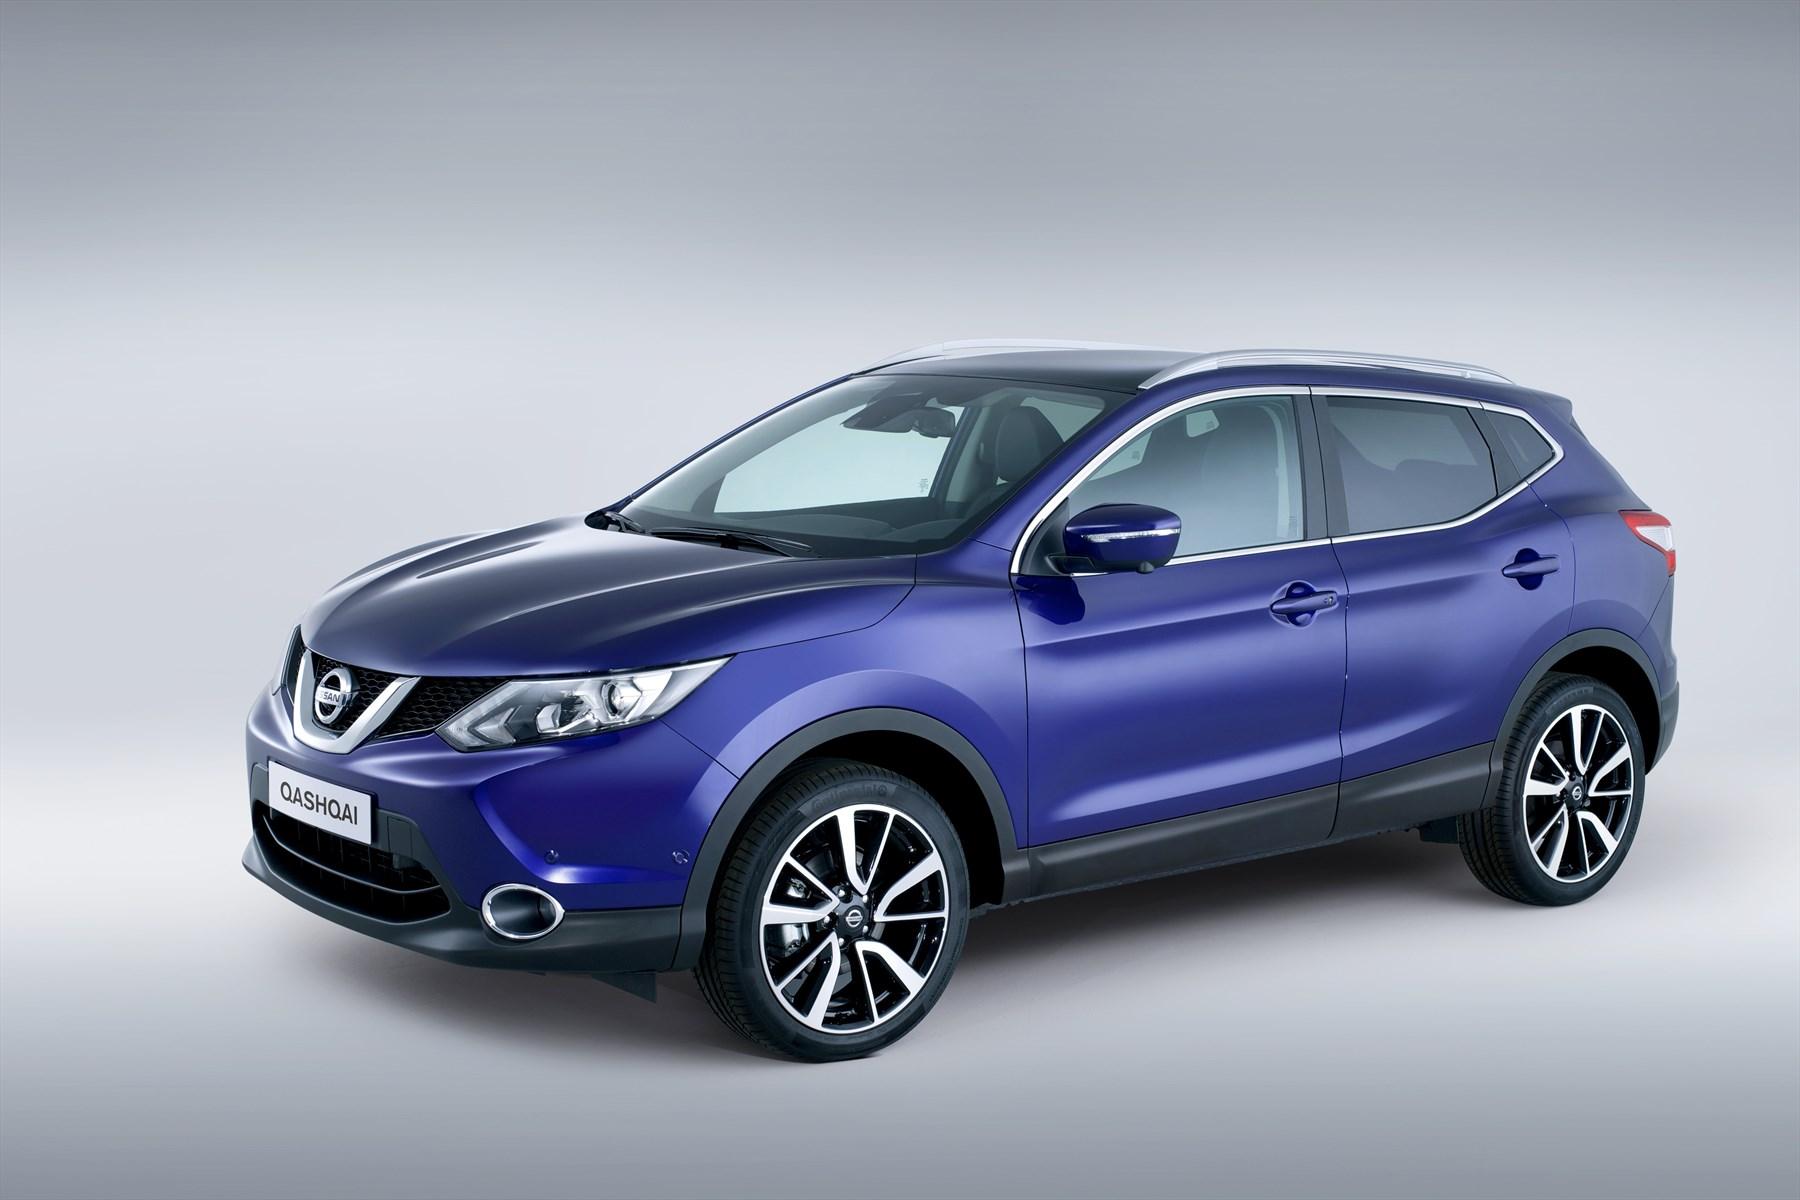 Nissan Brings New Qashqai to SA: Latest News